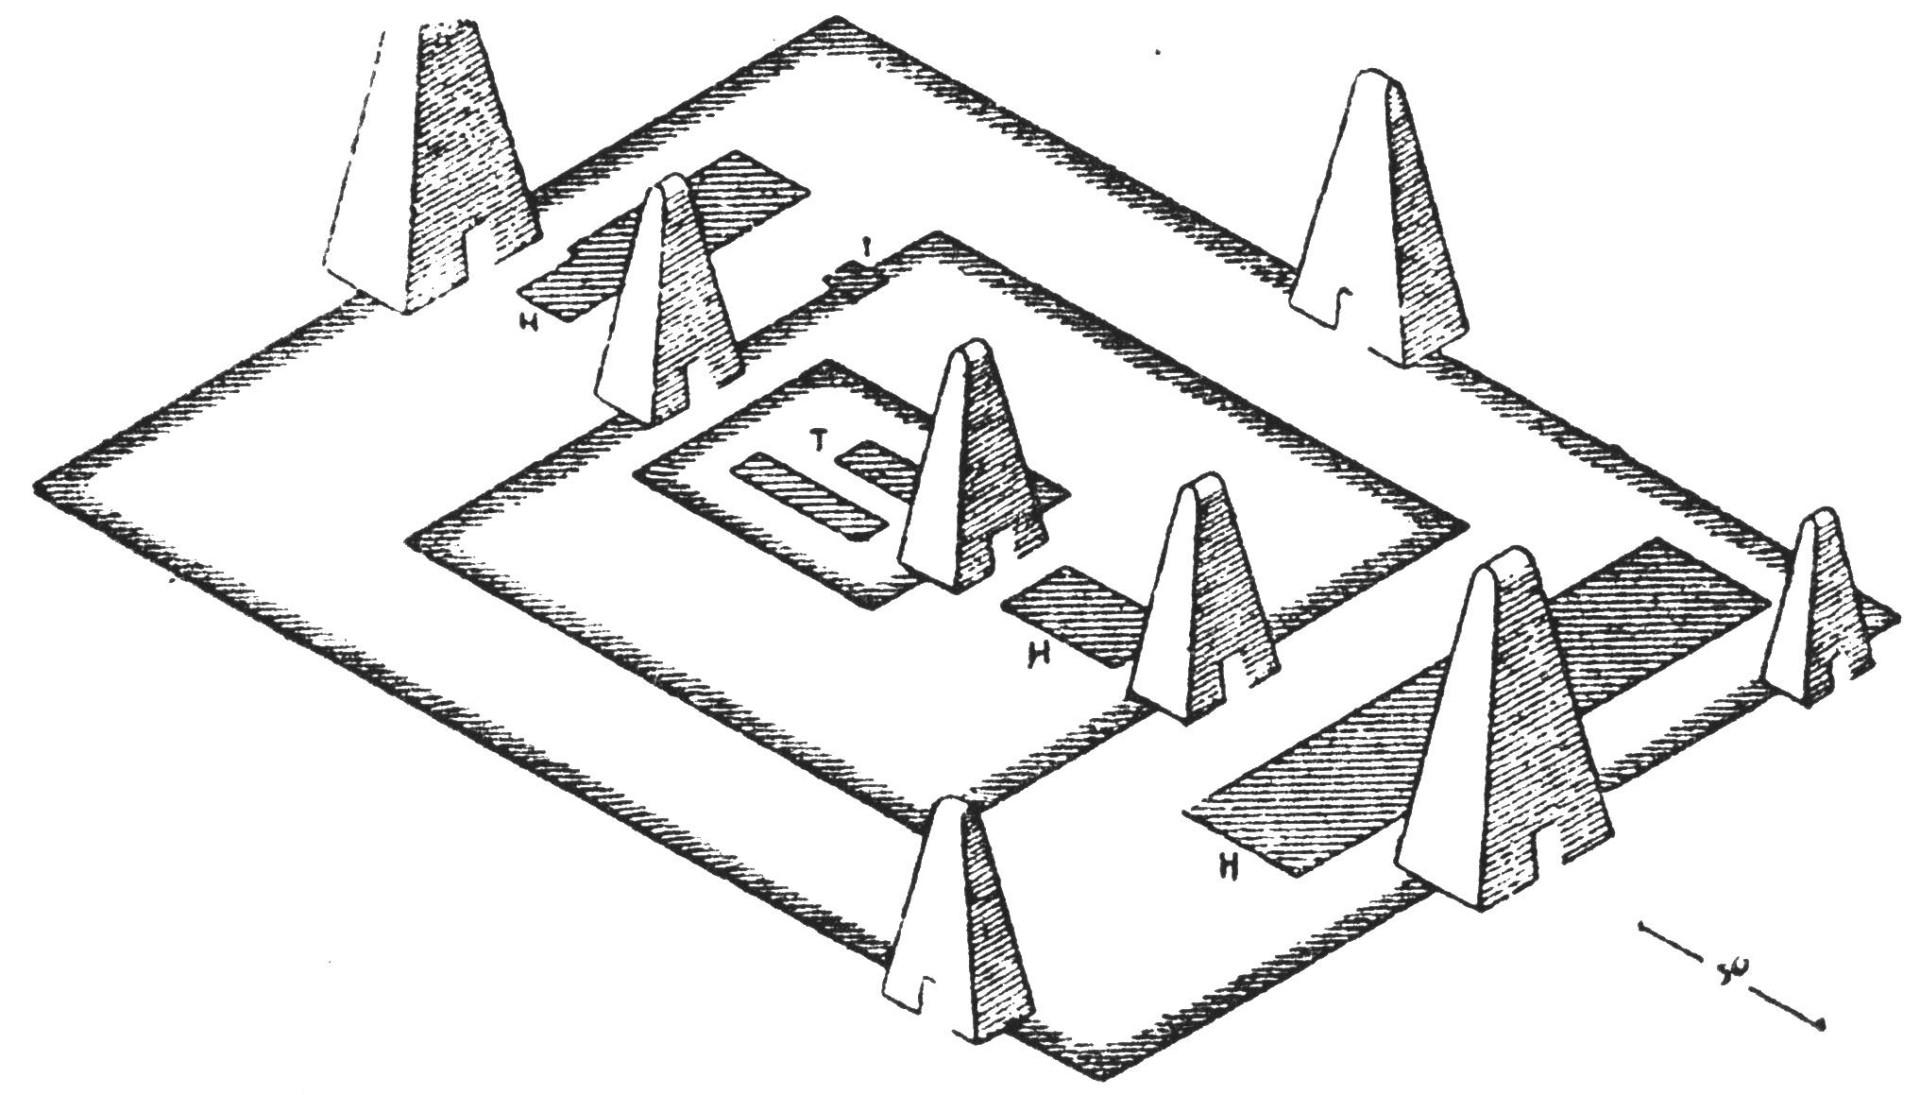 THE BREAKDOWN OF THE PROMENADE: image 8